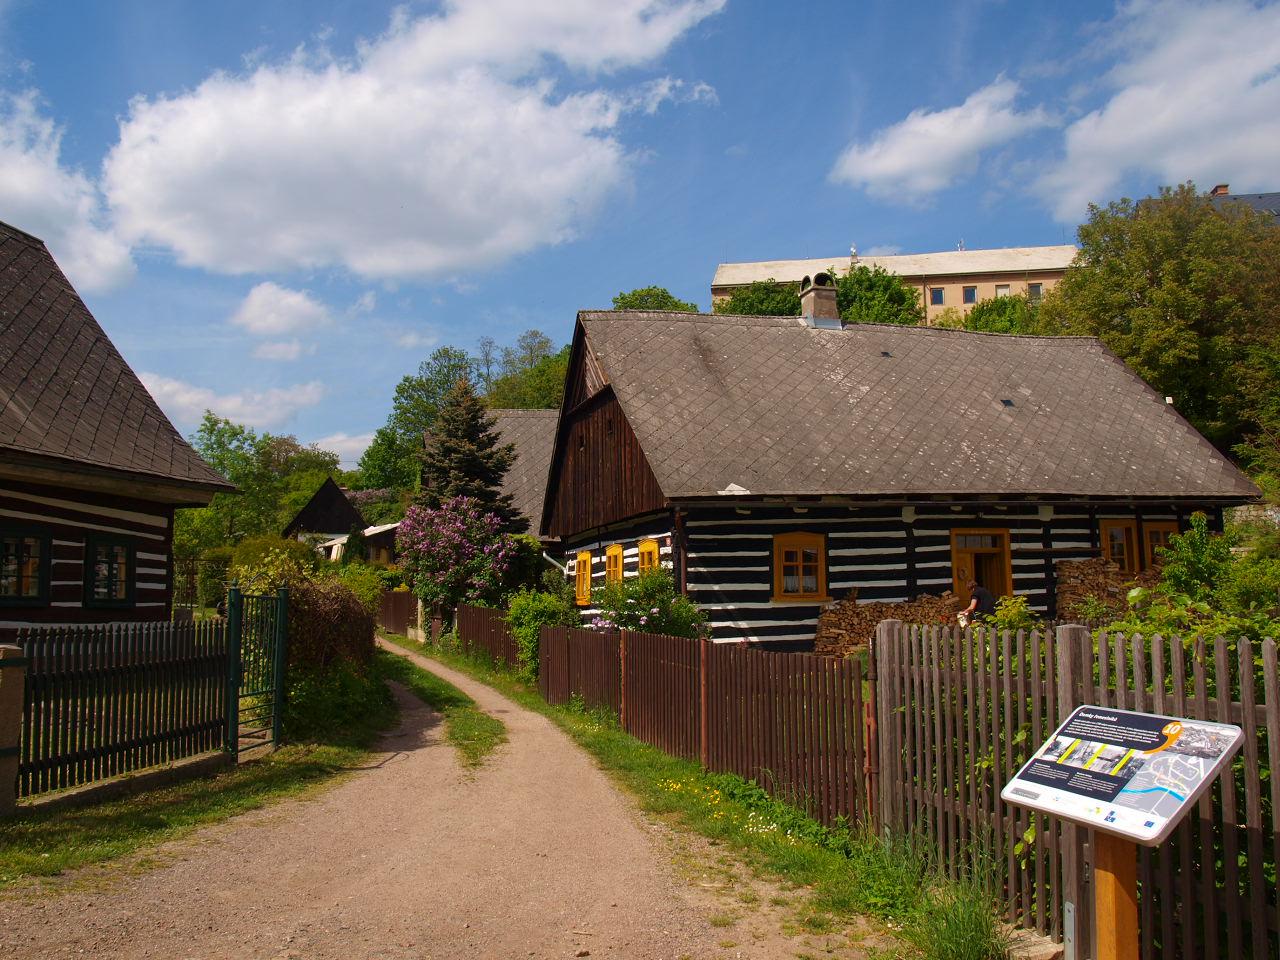 weeken w Czechach